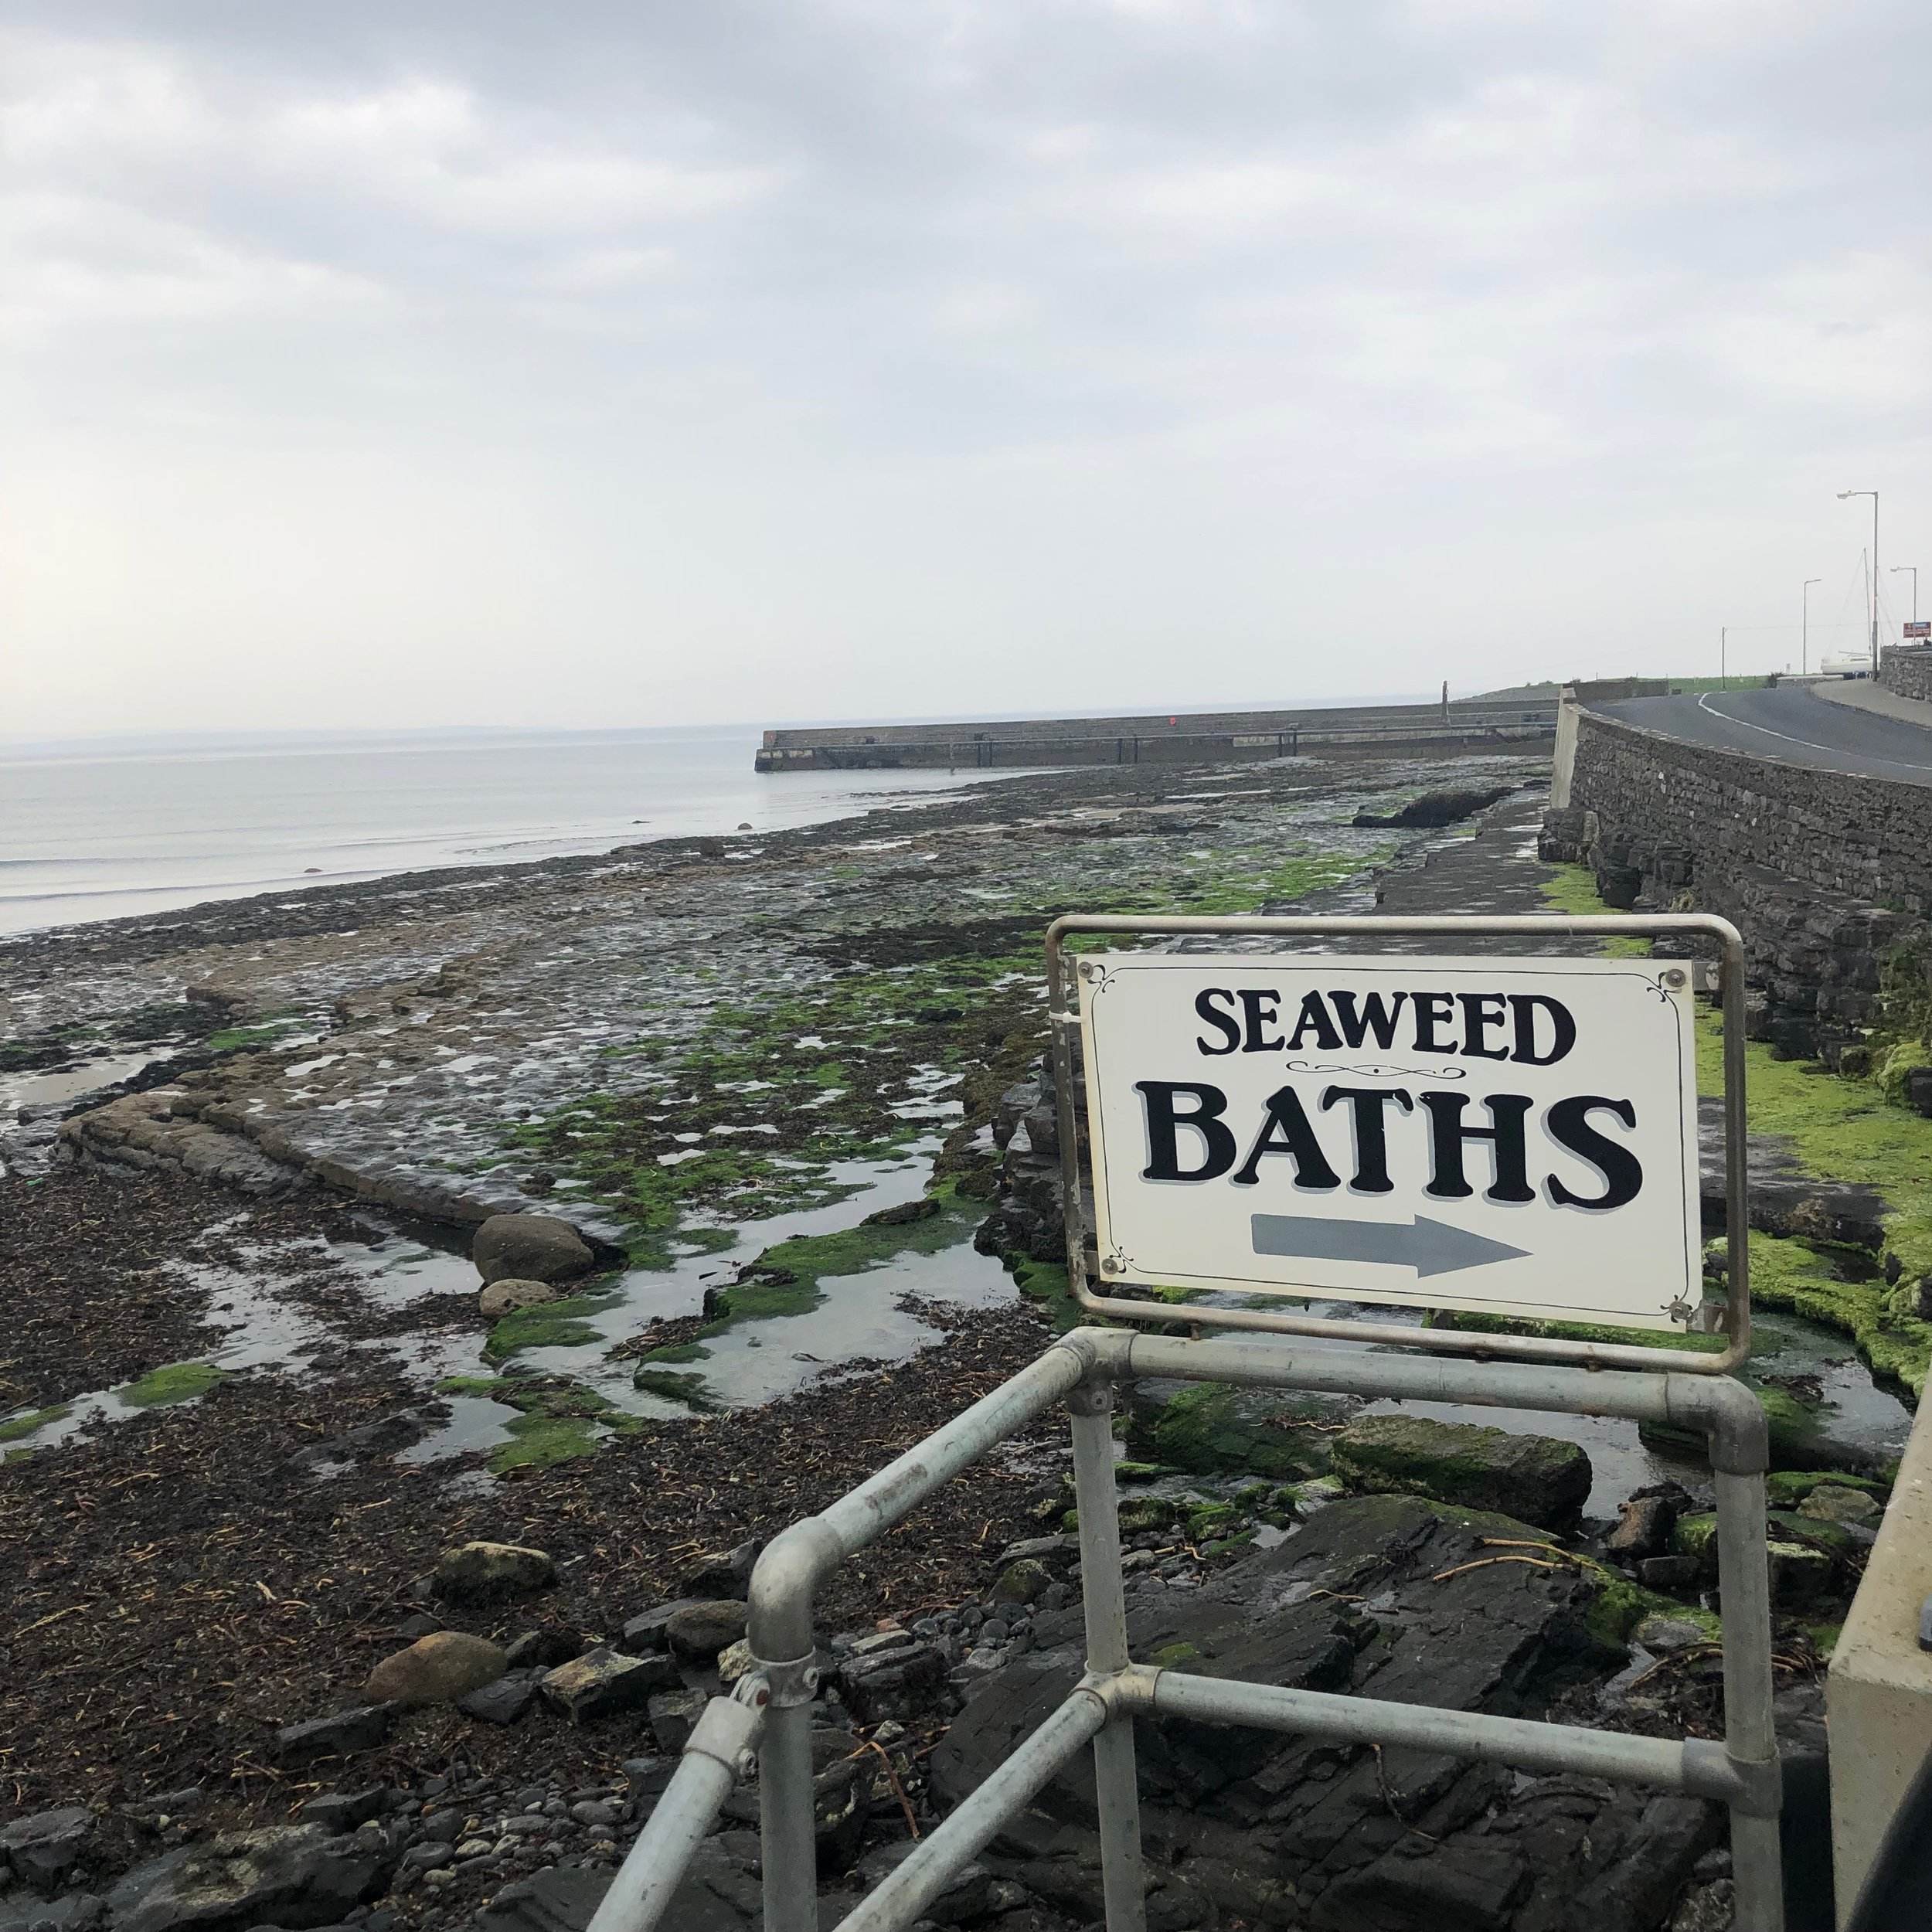 The Kilcullen Seaweed Baths at Enniscrone